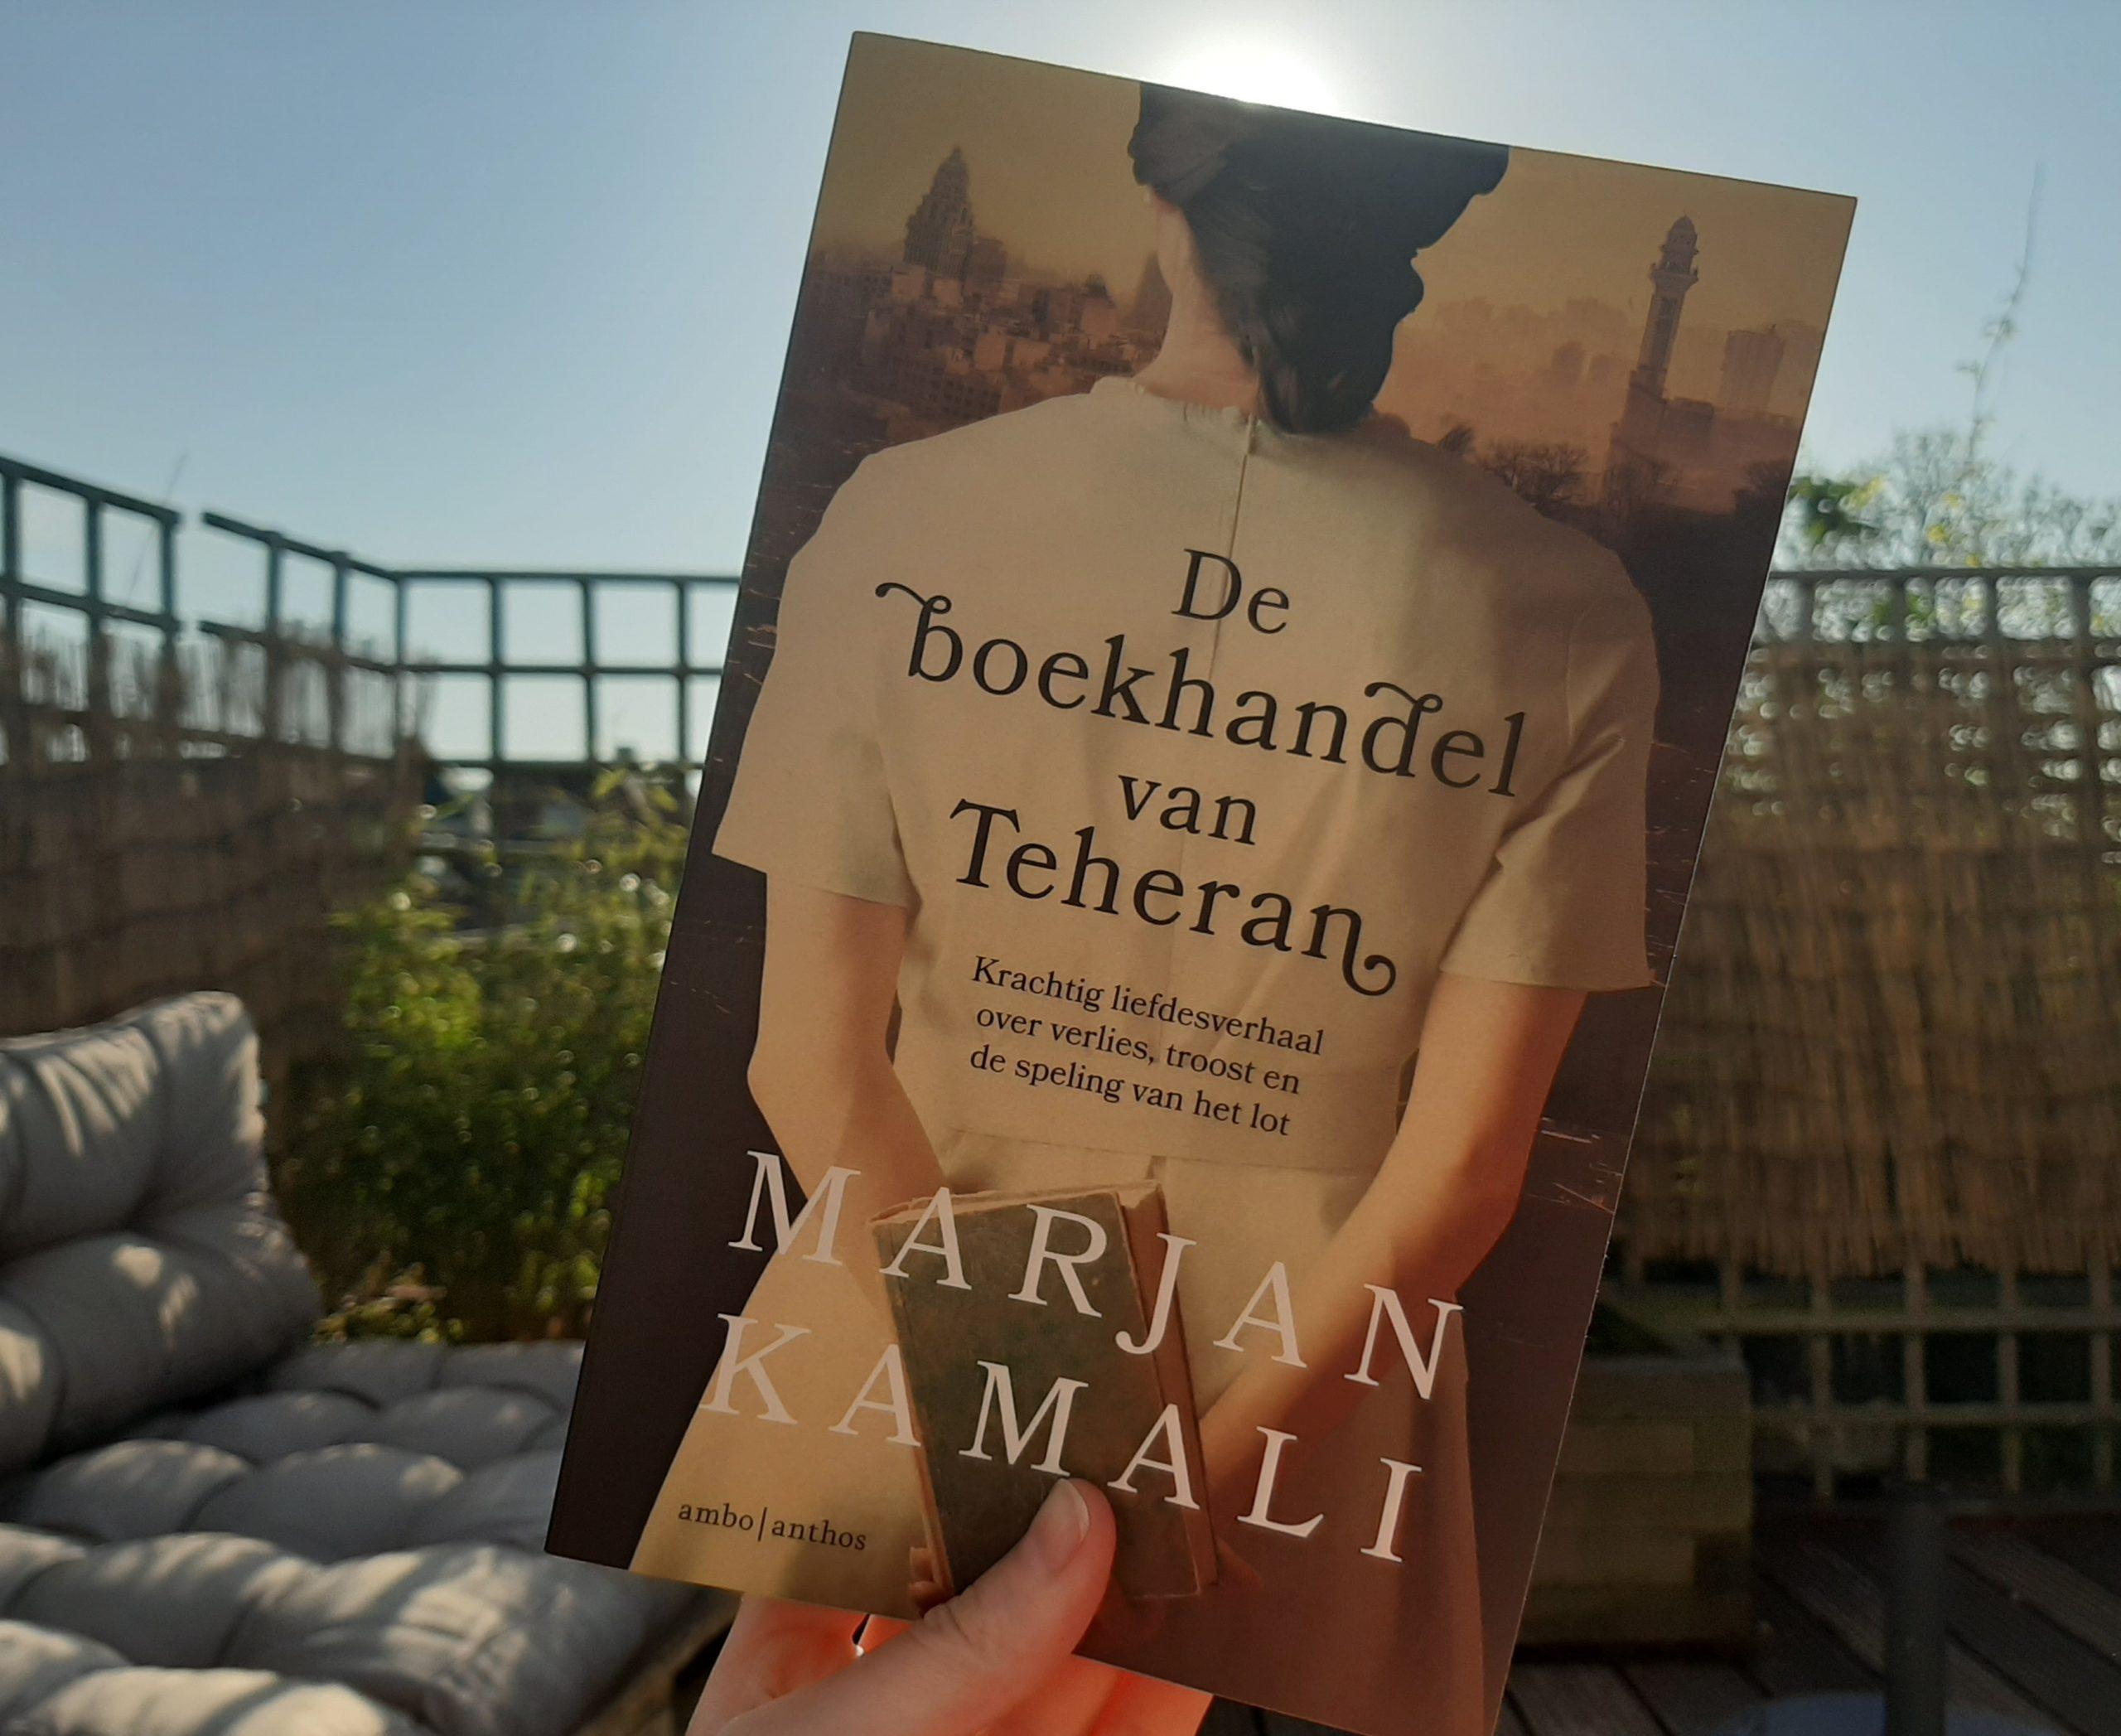 Readalicious Iris Windmeijer De boekhandel van Teheran.jpg